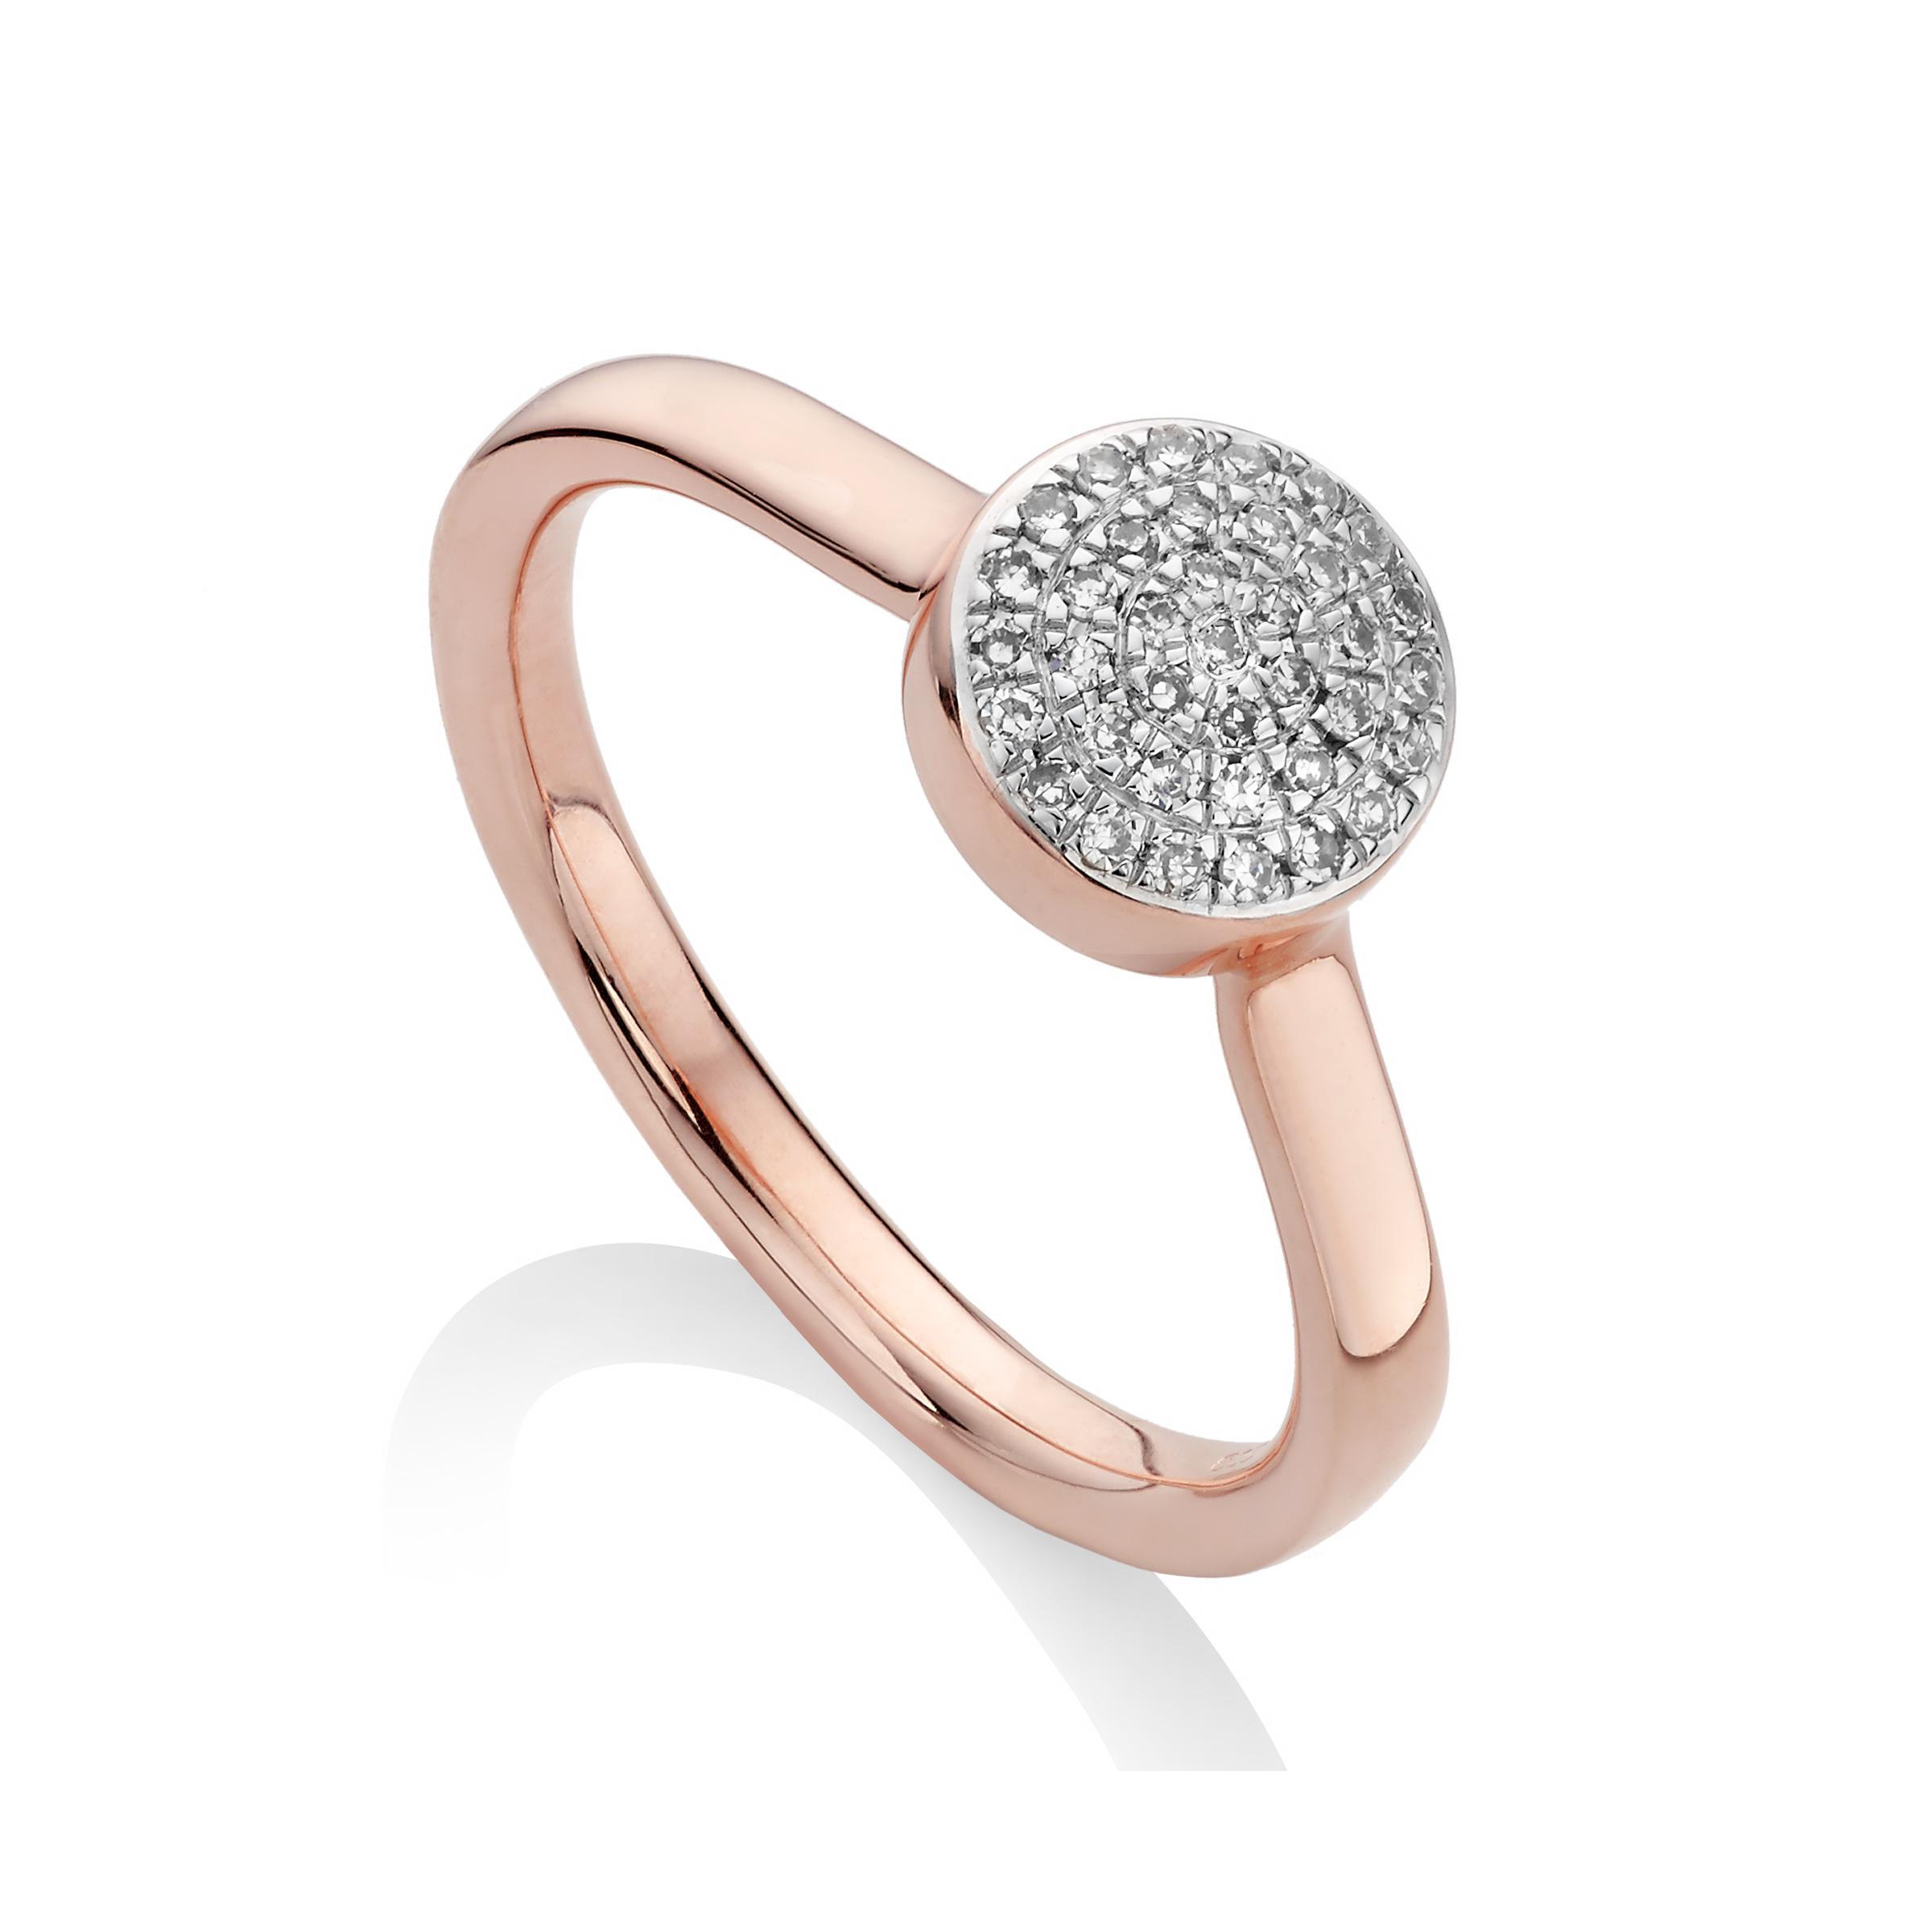 Ava Diamond Disc Ring, Sterling Silver Monica Vinader